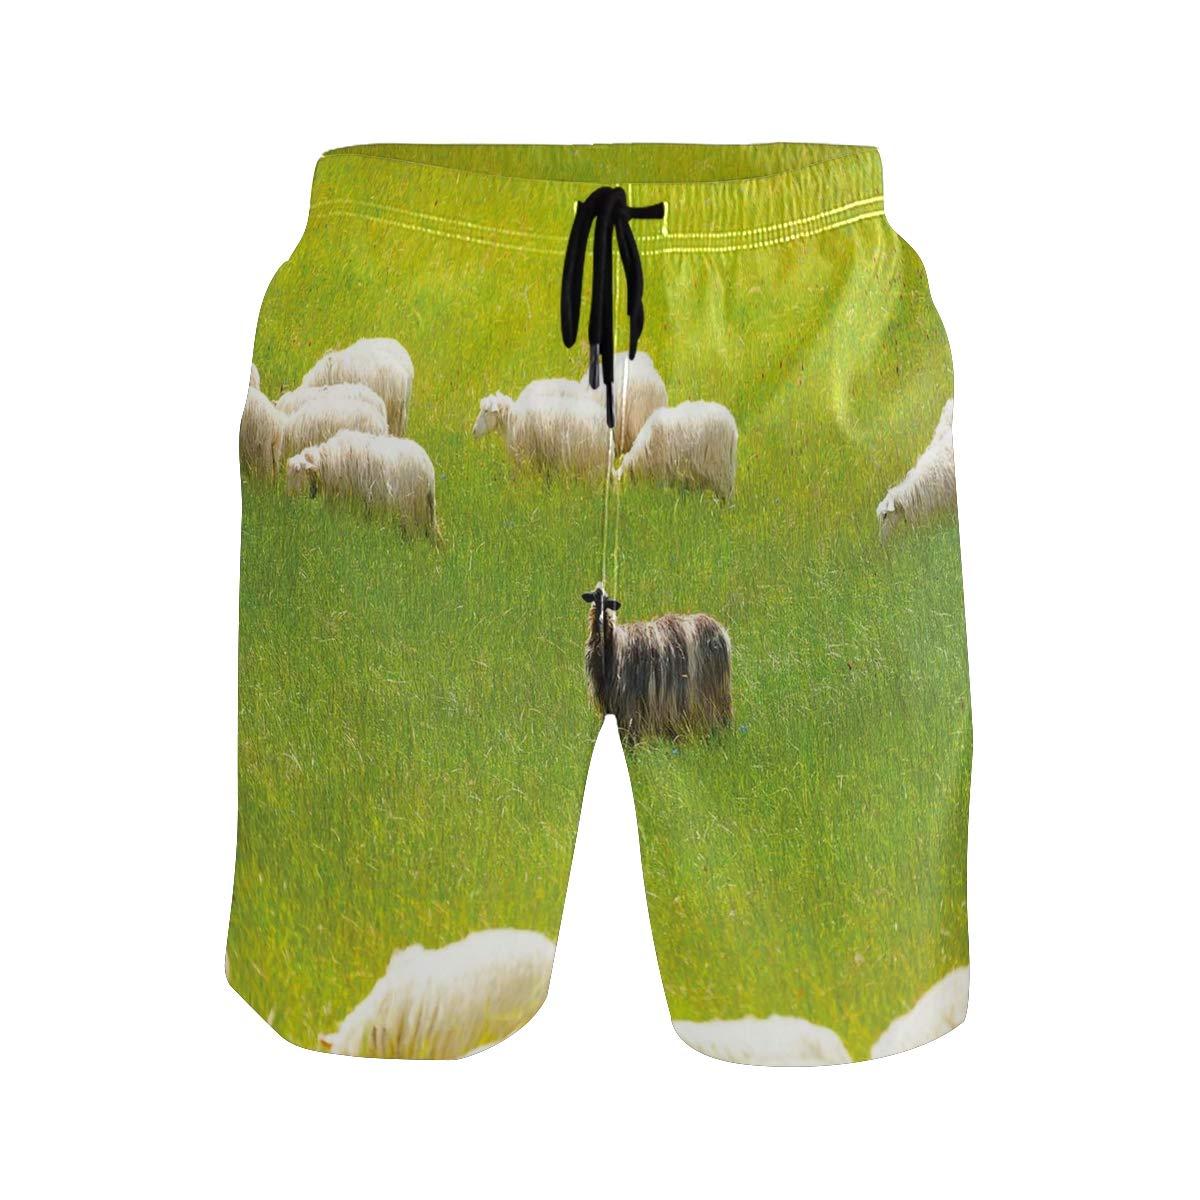 KVMV Black Sheep Between White Goats On Grass Field Meadow A Quick Dry Beach Shorts